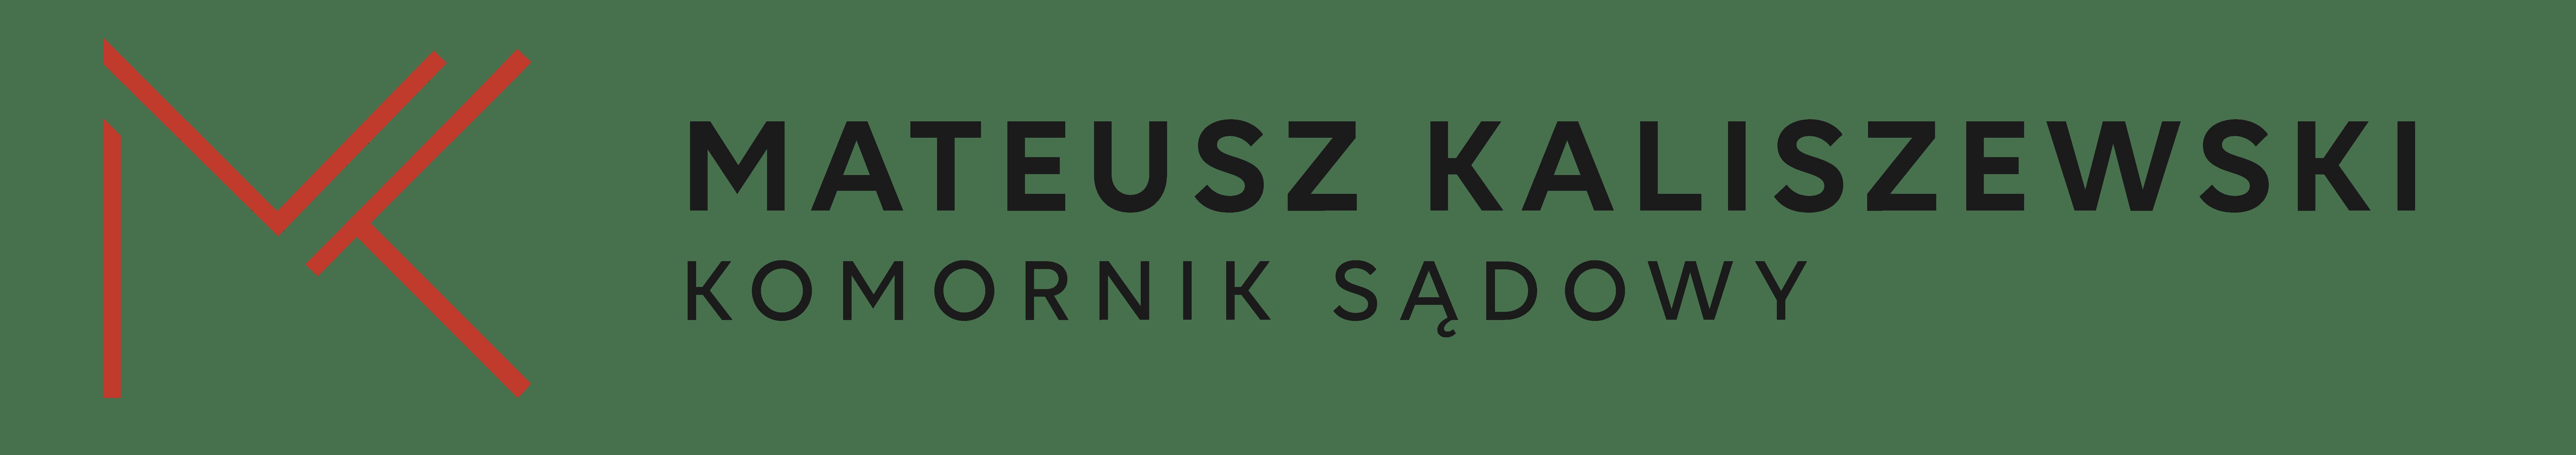 Komornik Sądowy Mateusz Kaliszewski